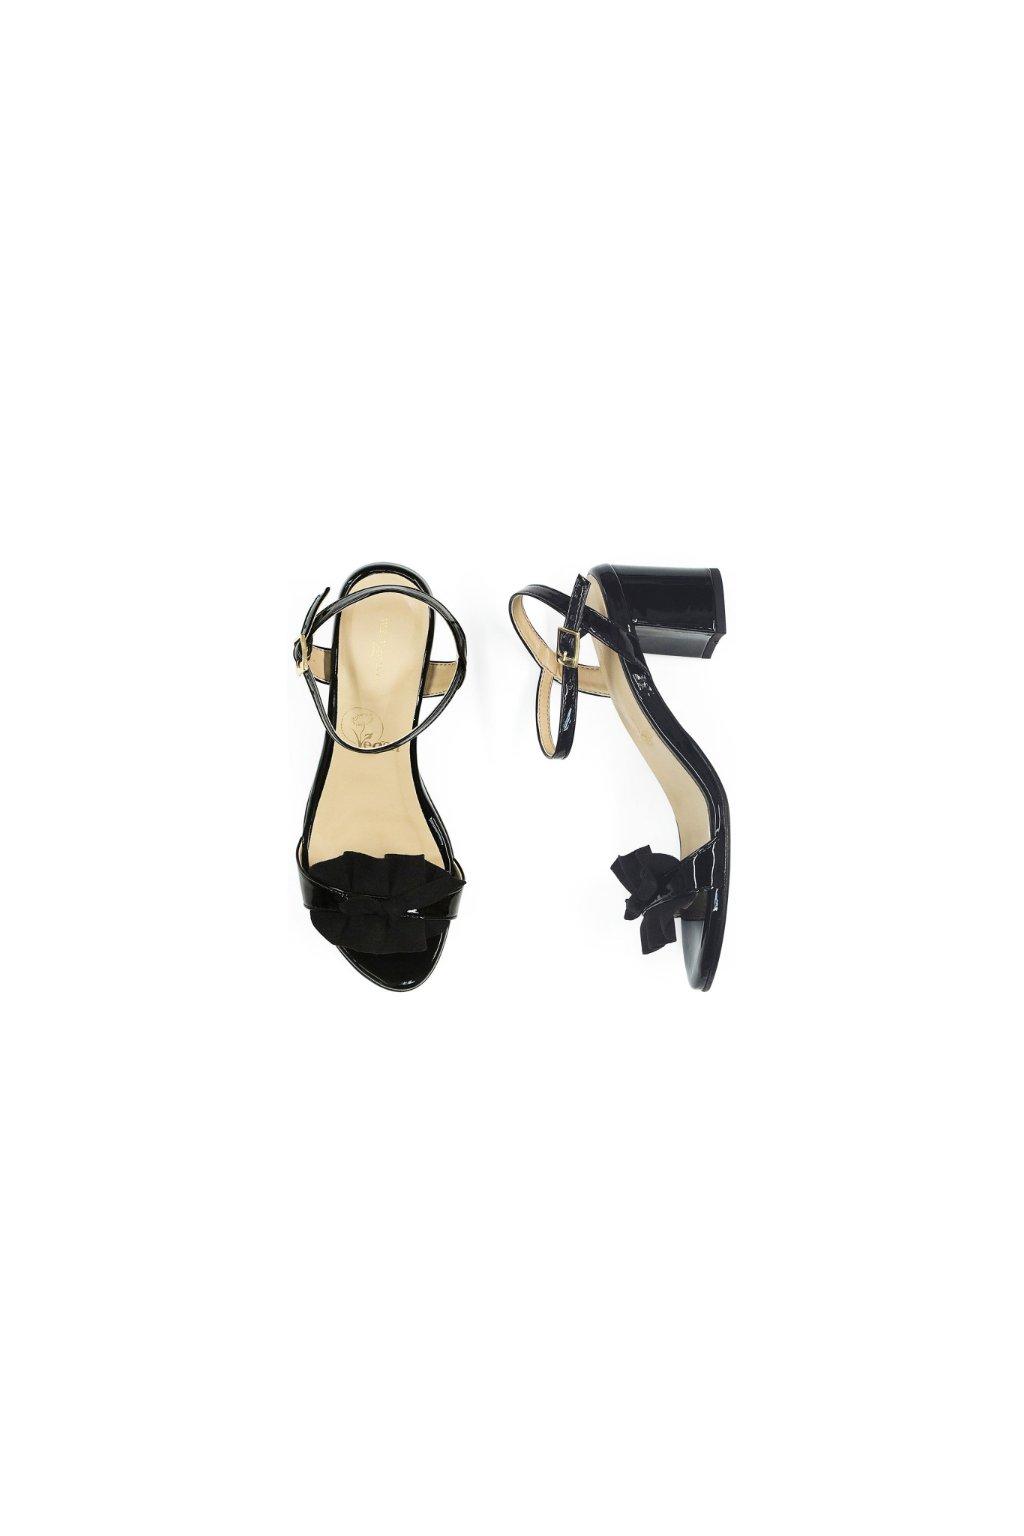 "Dámske čierne sandálky ""Ruffle Sandals"""